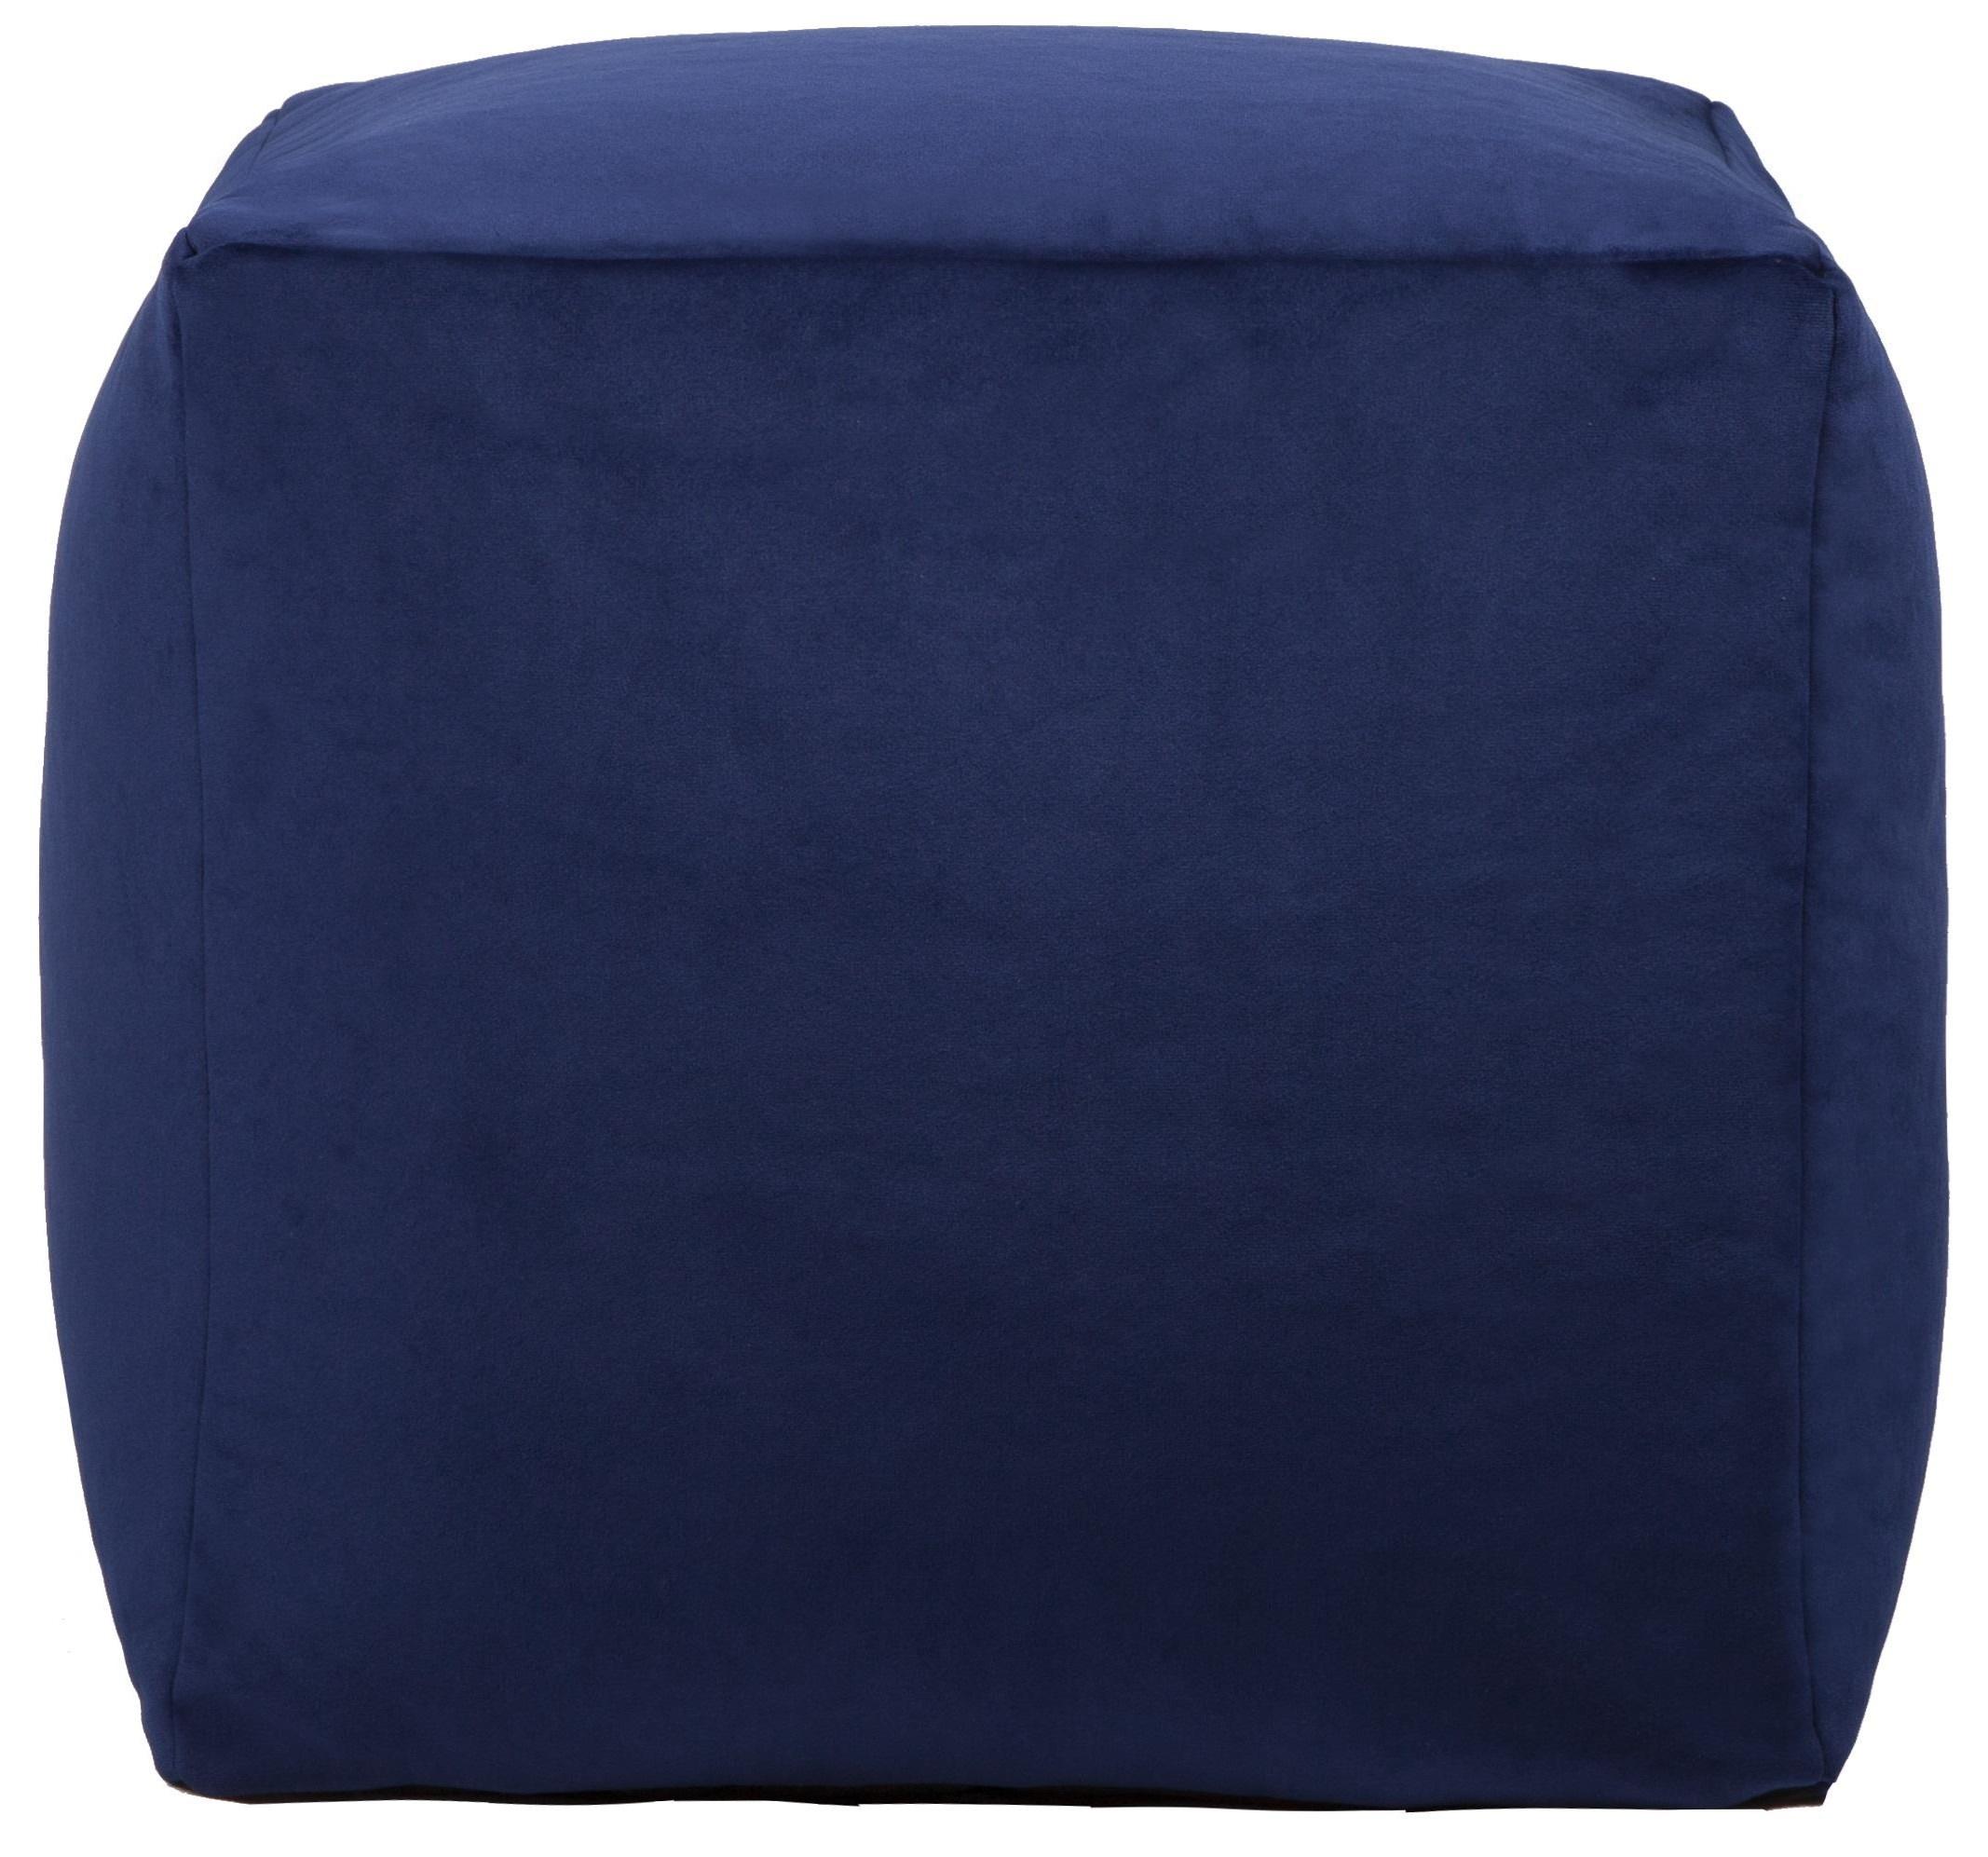 Blue Cube Beanbag